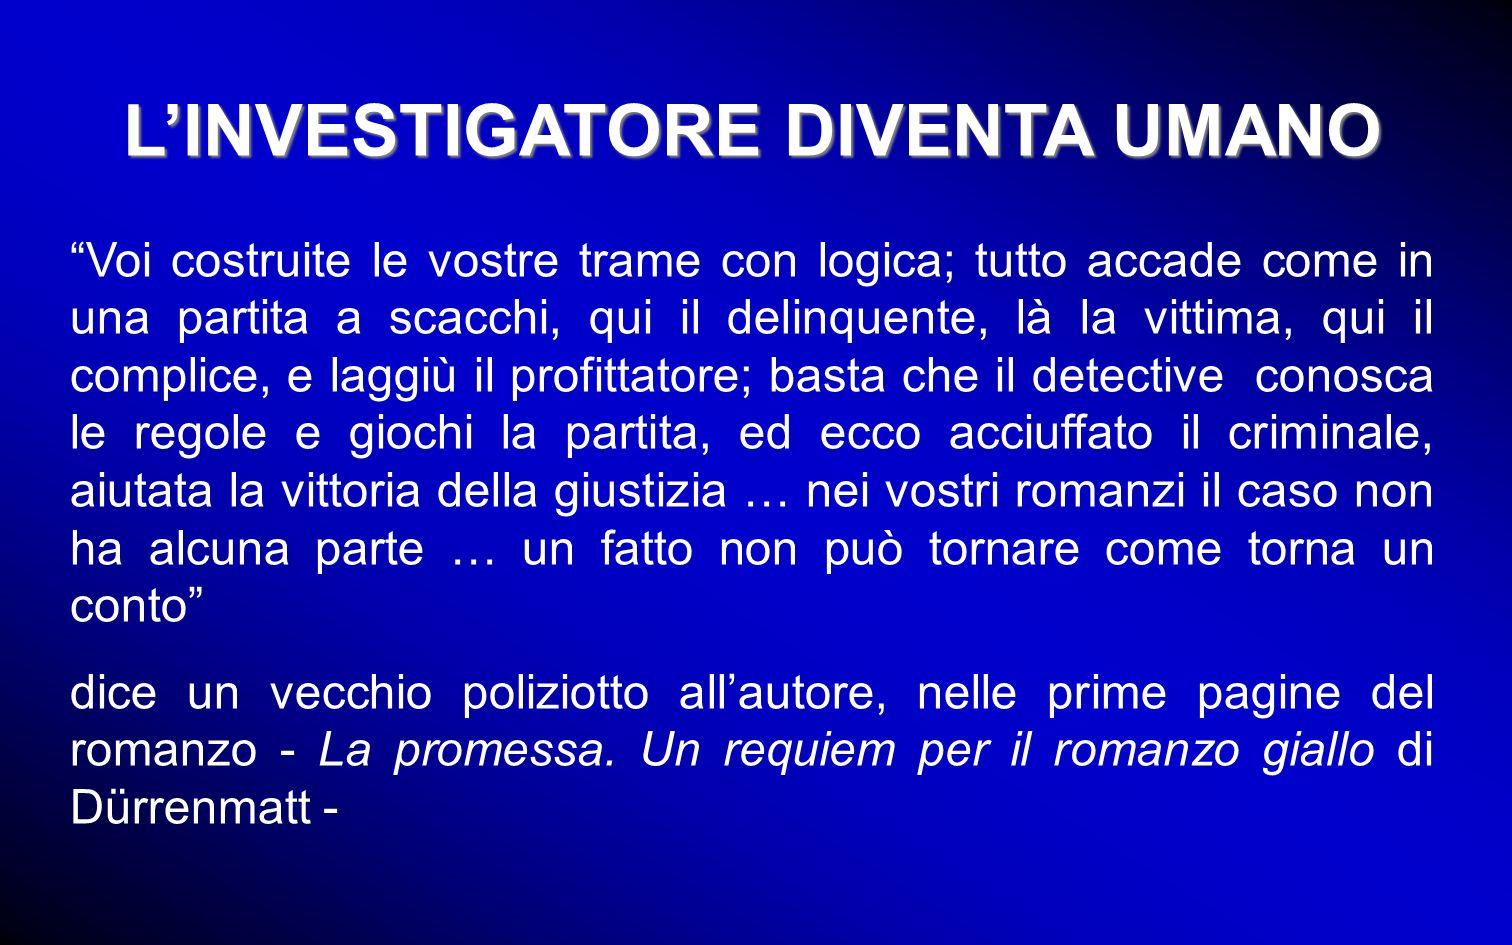 L'INVESTIGATORE DIVENTA UMANO